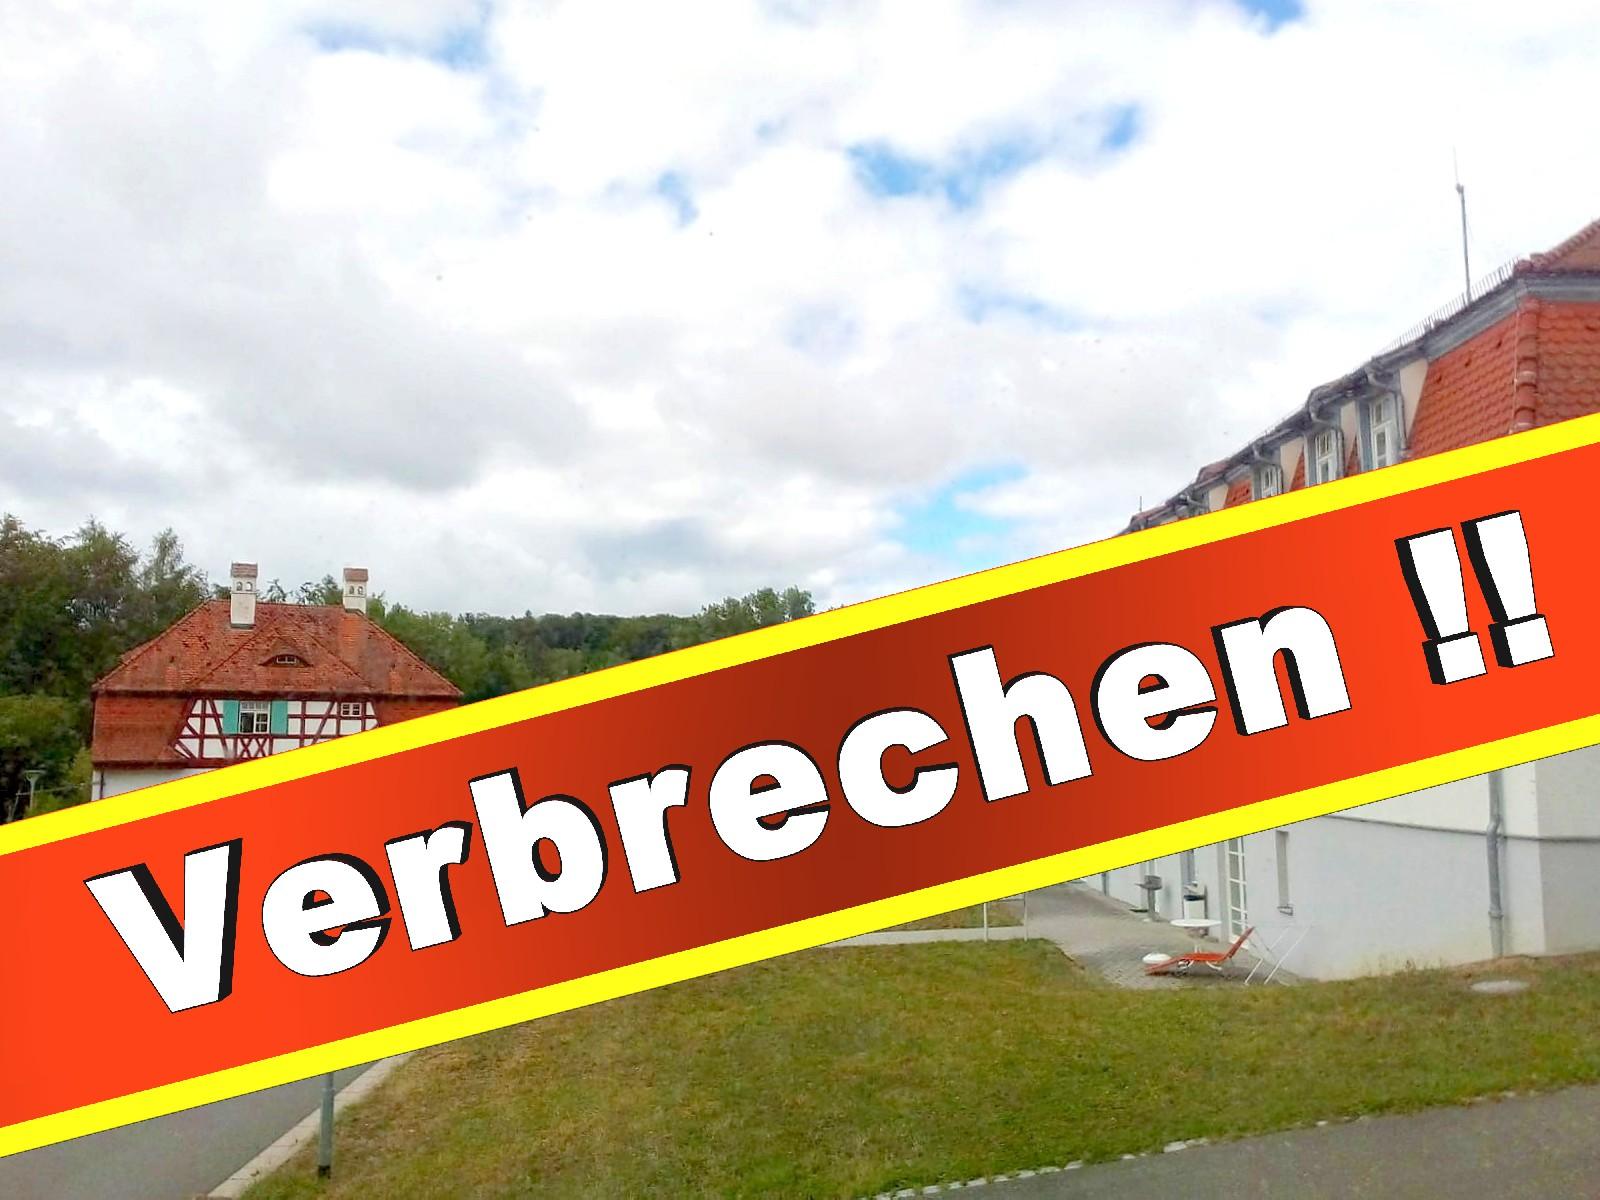 Bezirksklinikum Obermain Kutzenberg, 96250 Ebensfeld Psychiatrie Polizei Krankenhaus (6)